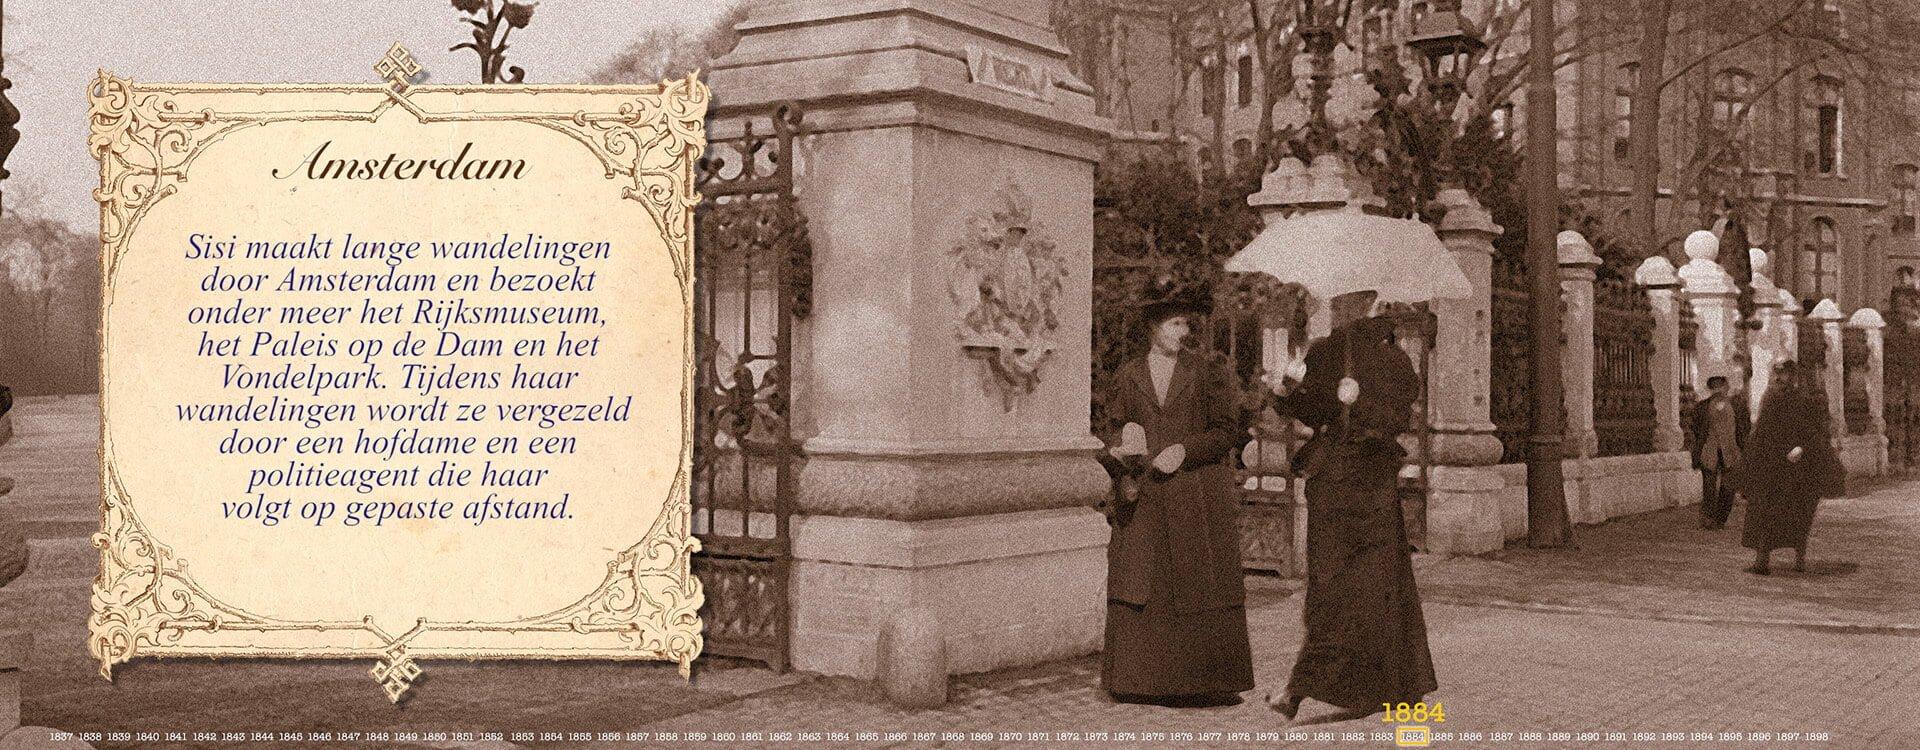 Sisi in Amsterdam Vondelpark 1884